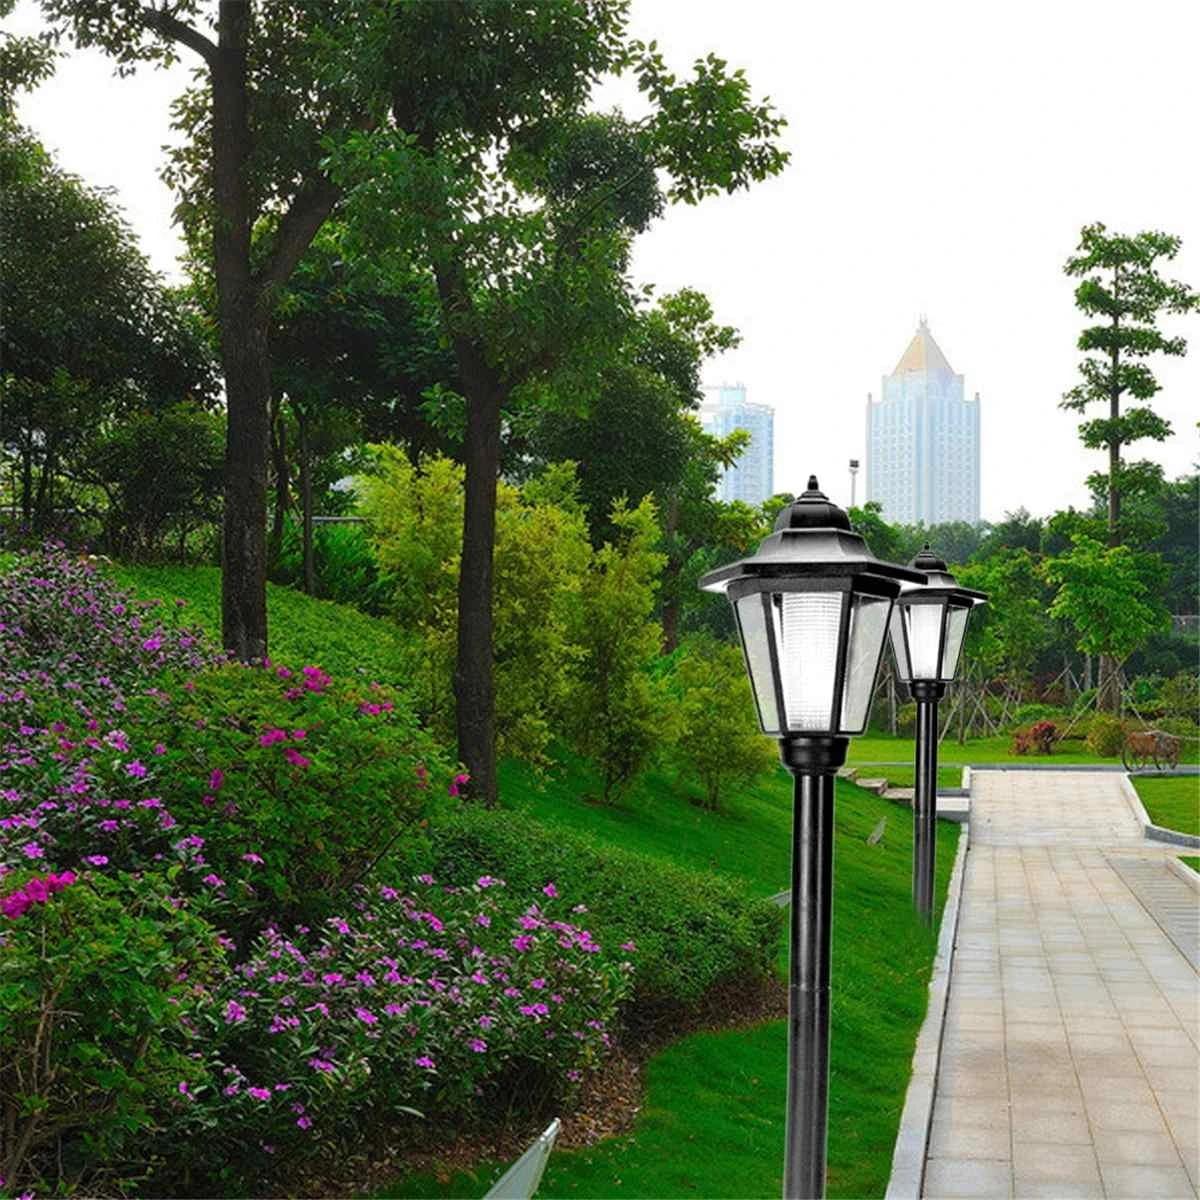 Taman Dekorasi Lampu Halaman Lampu Taman Outdoor Lentera Pilar Halaman Putih Lampu Led Solar Light Di Bawah Tanah Rumput Lampu Aliexpress